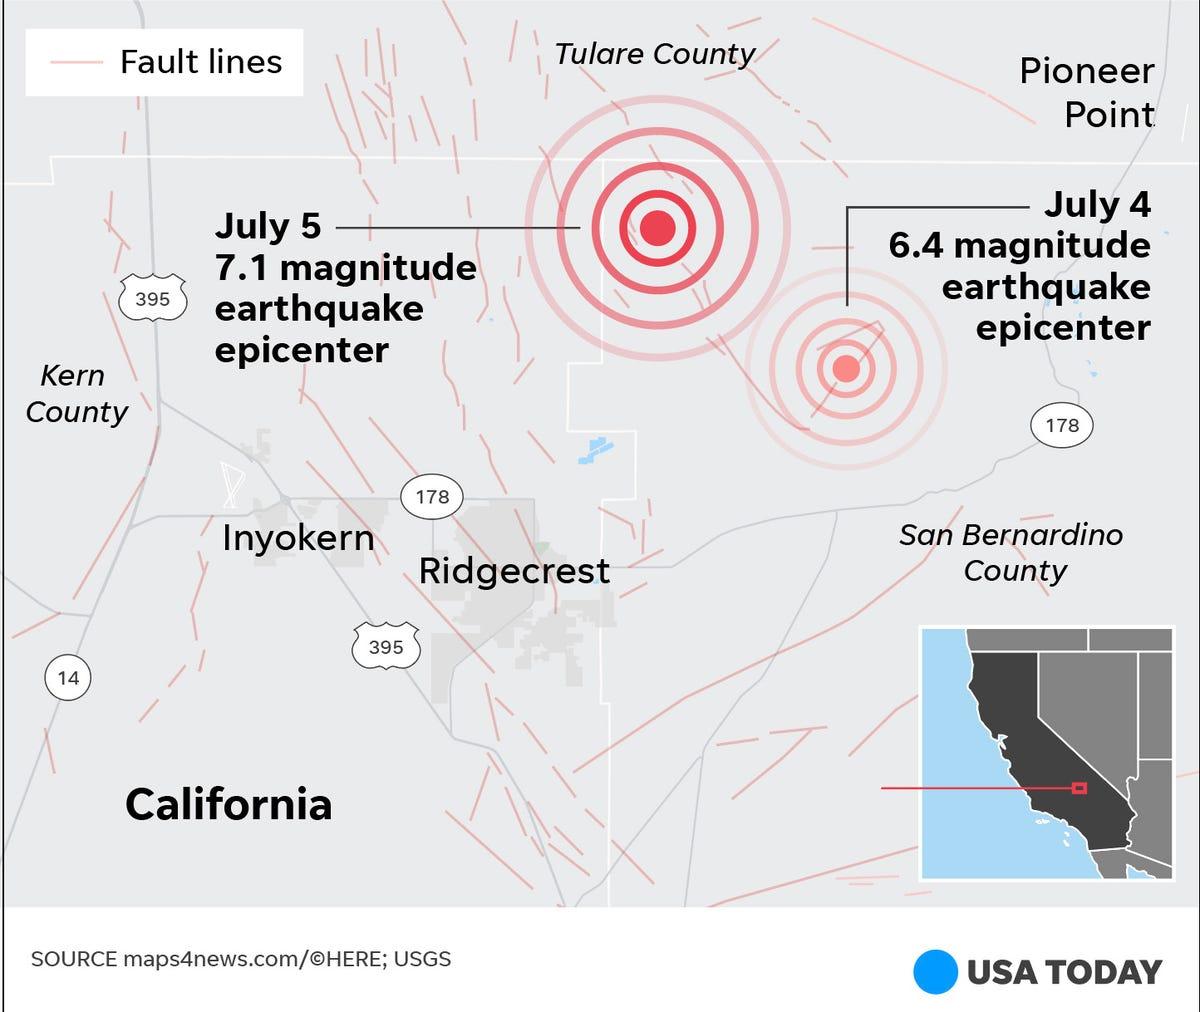 No, the Ridgecrest earthquakes weren't along the San Andreas fault